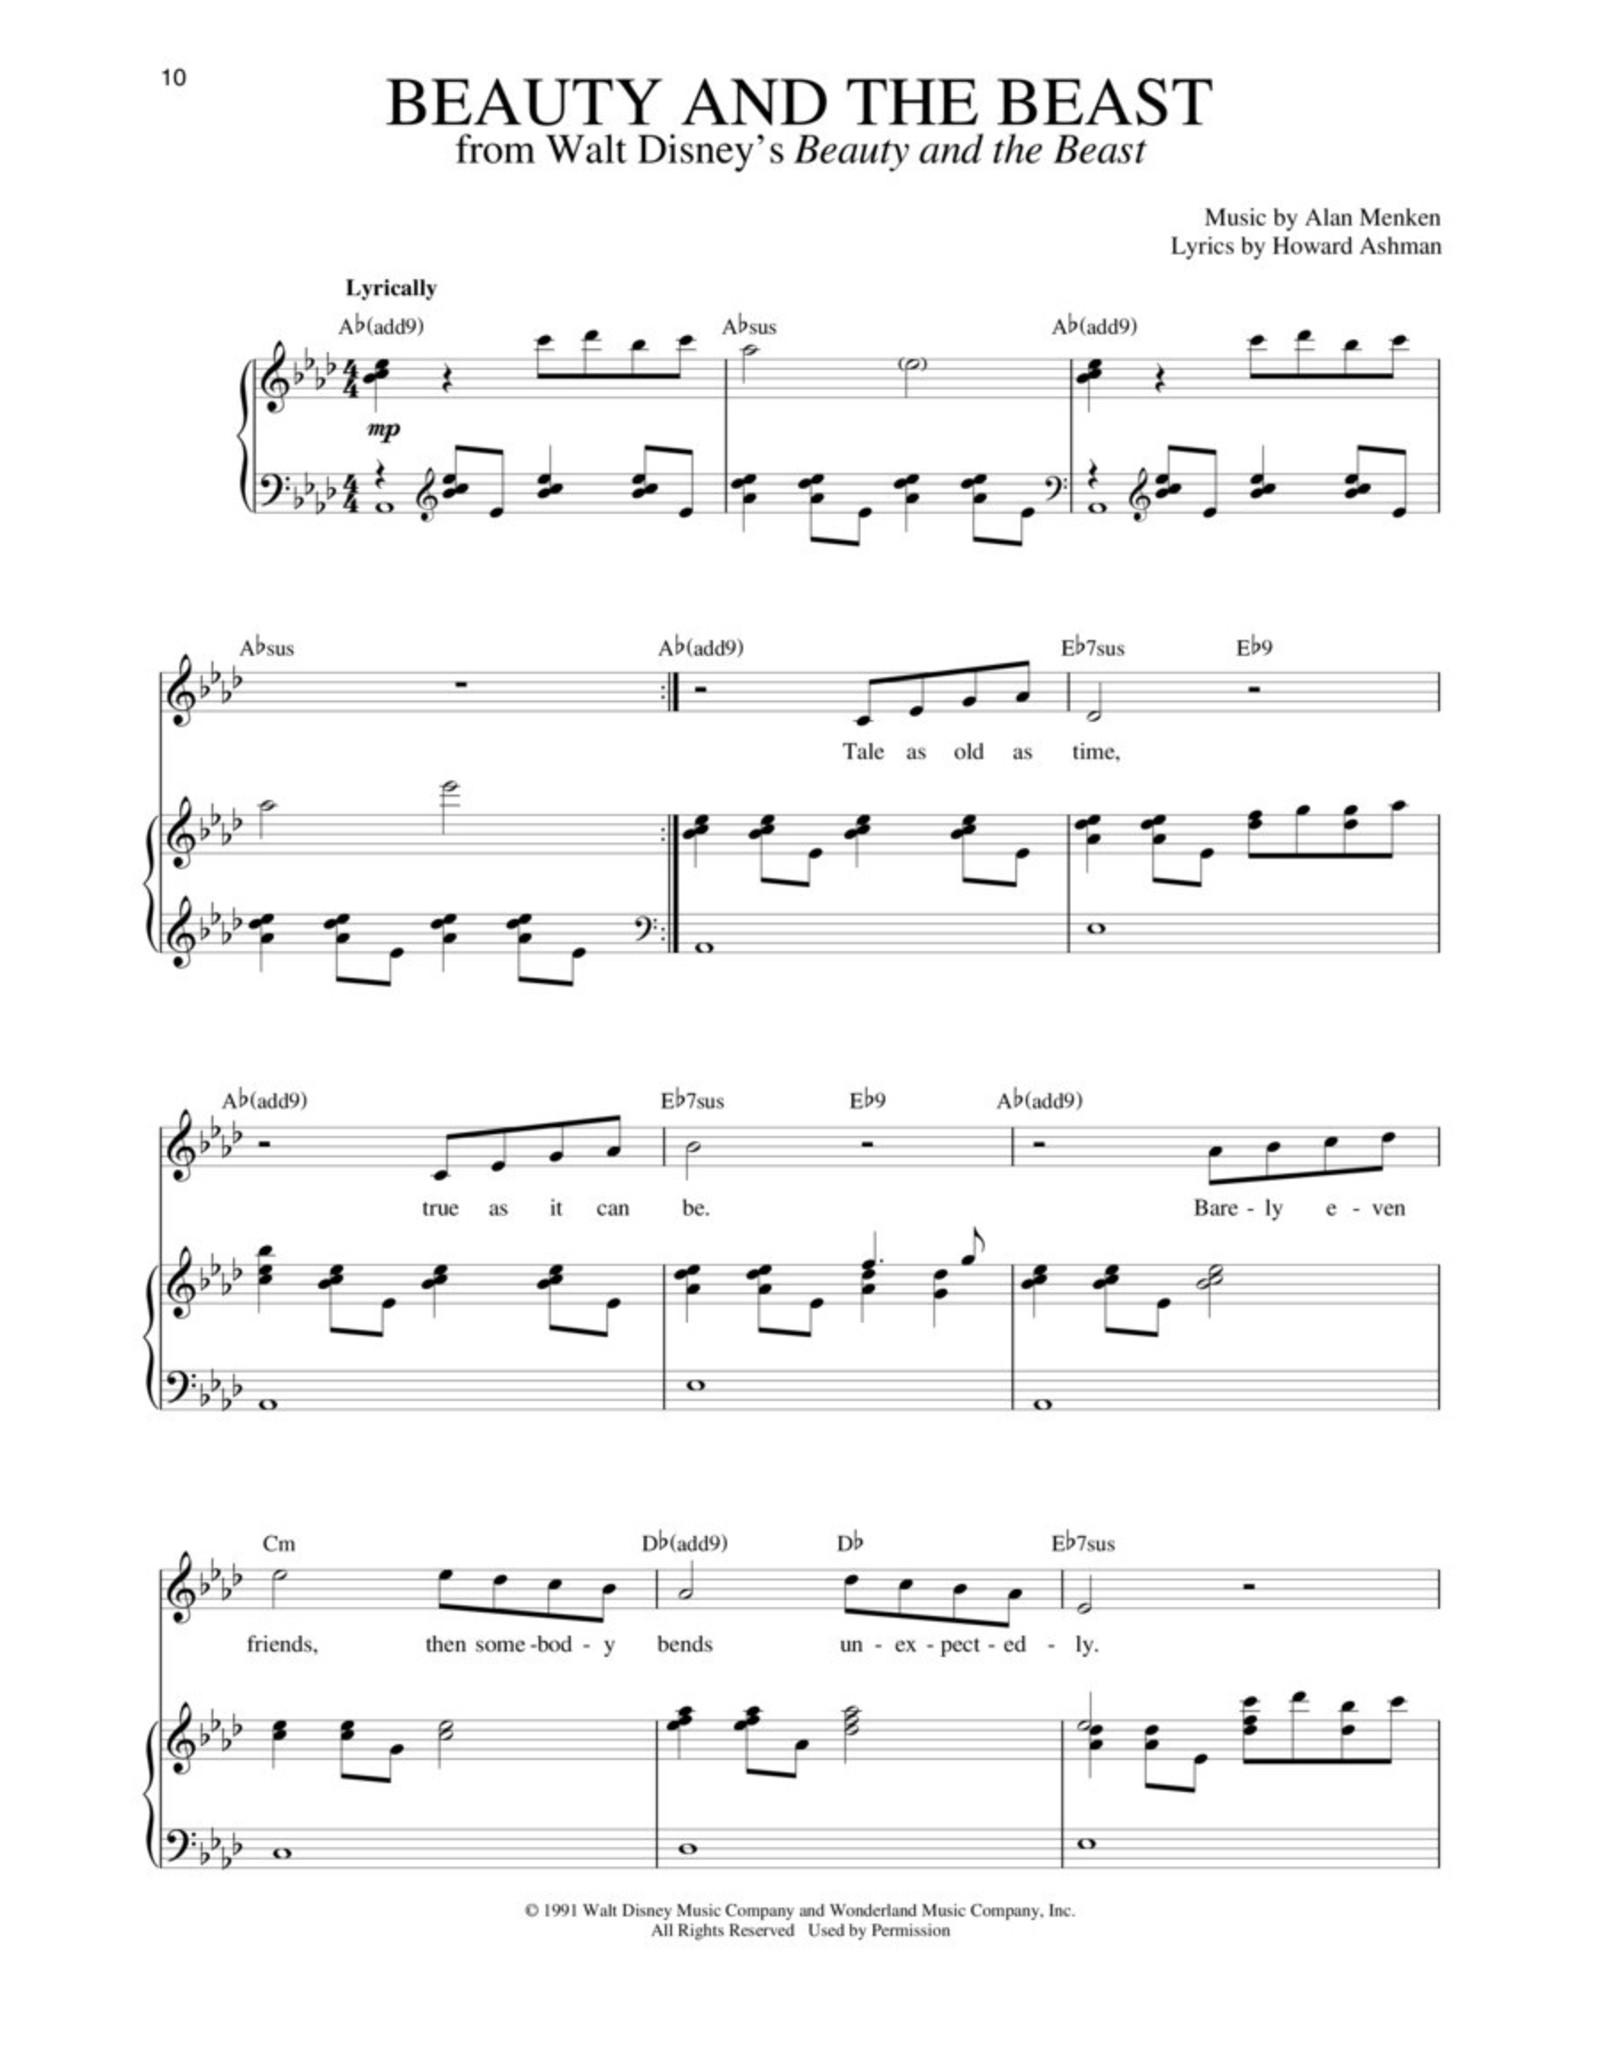 Hal Leonard Disney Songs for Singers - 54 Classics for High Voice